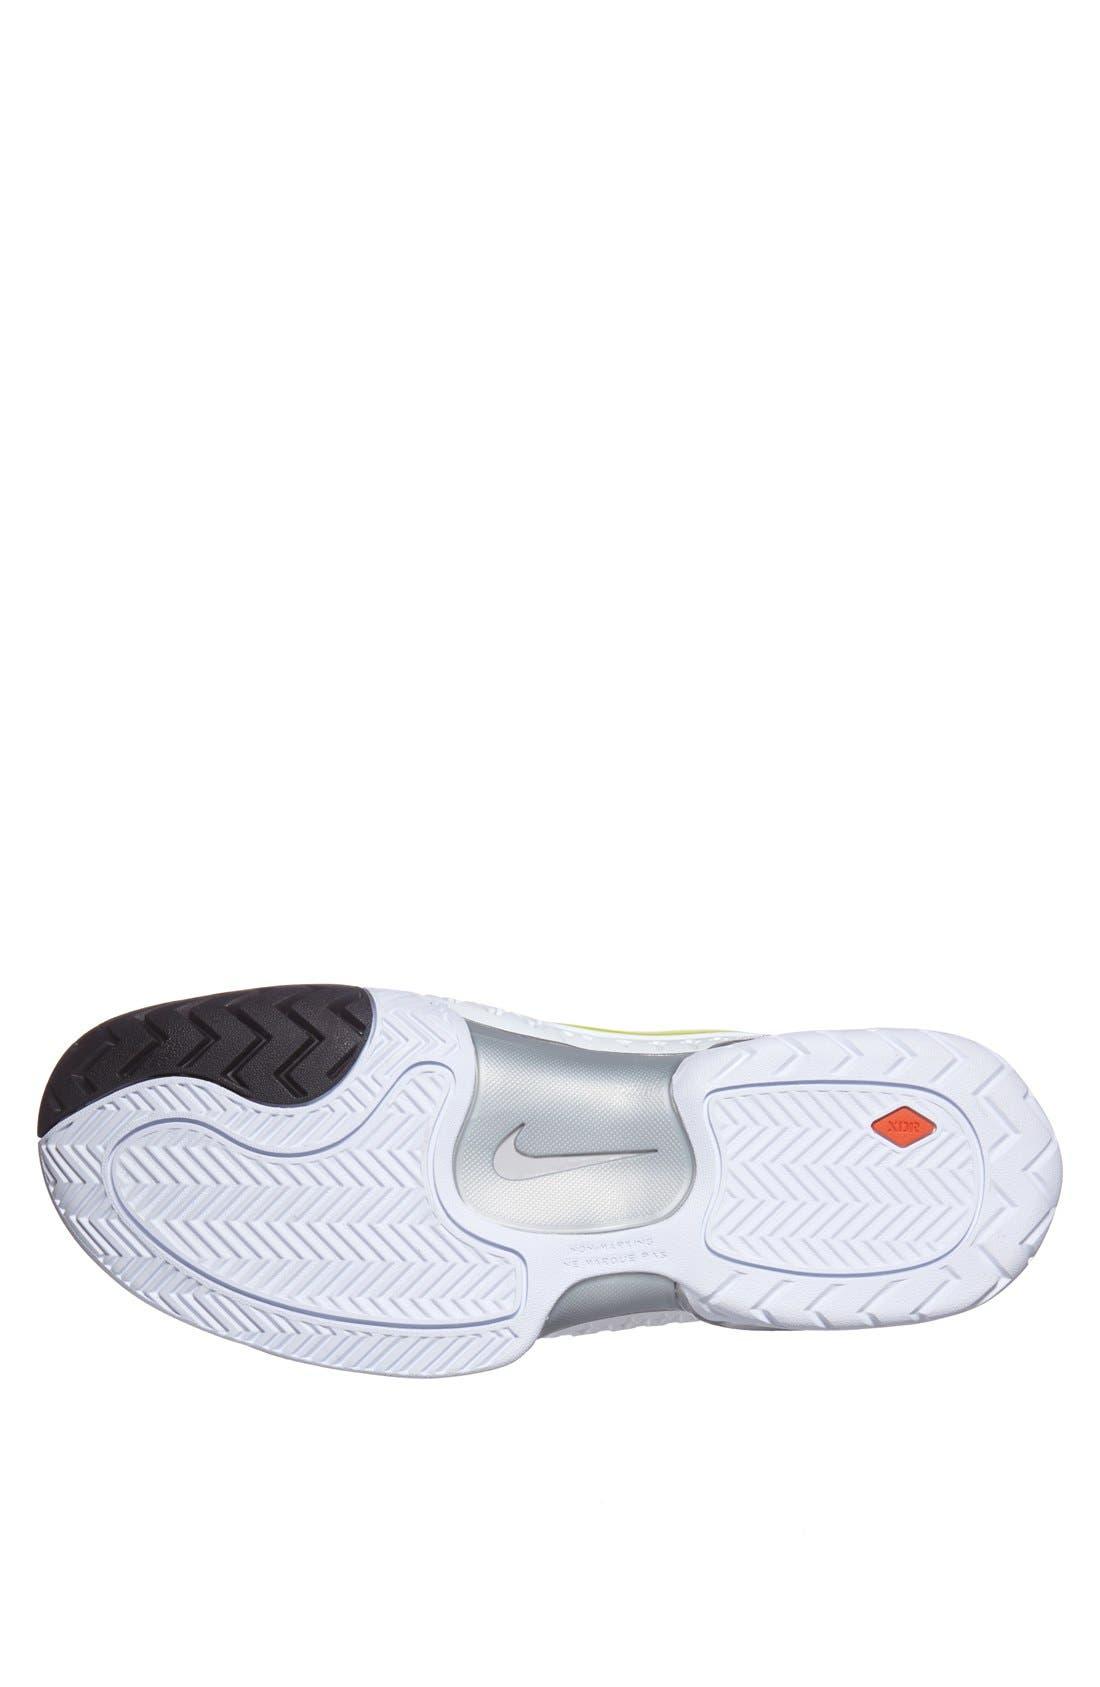 Alternate Image 4  - Nike 'Air Max Cage' Tennis Shoe (Men)